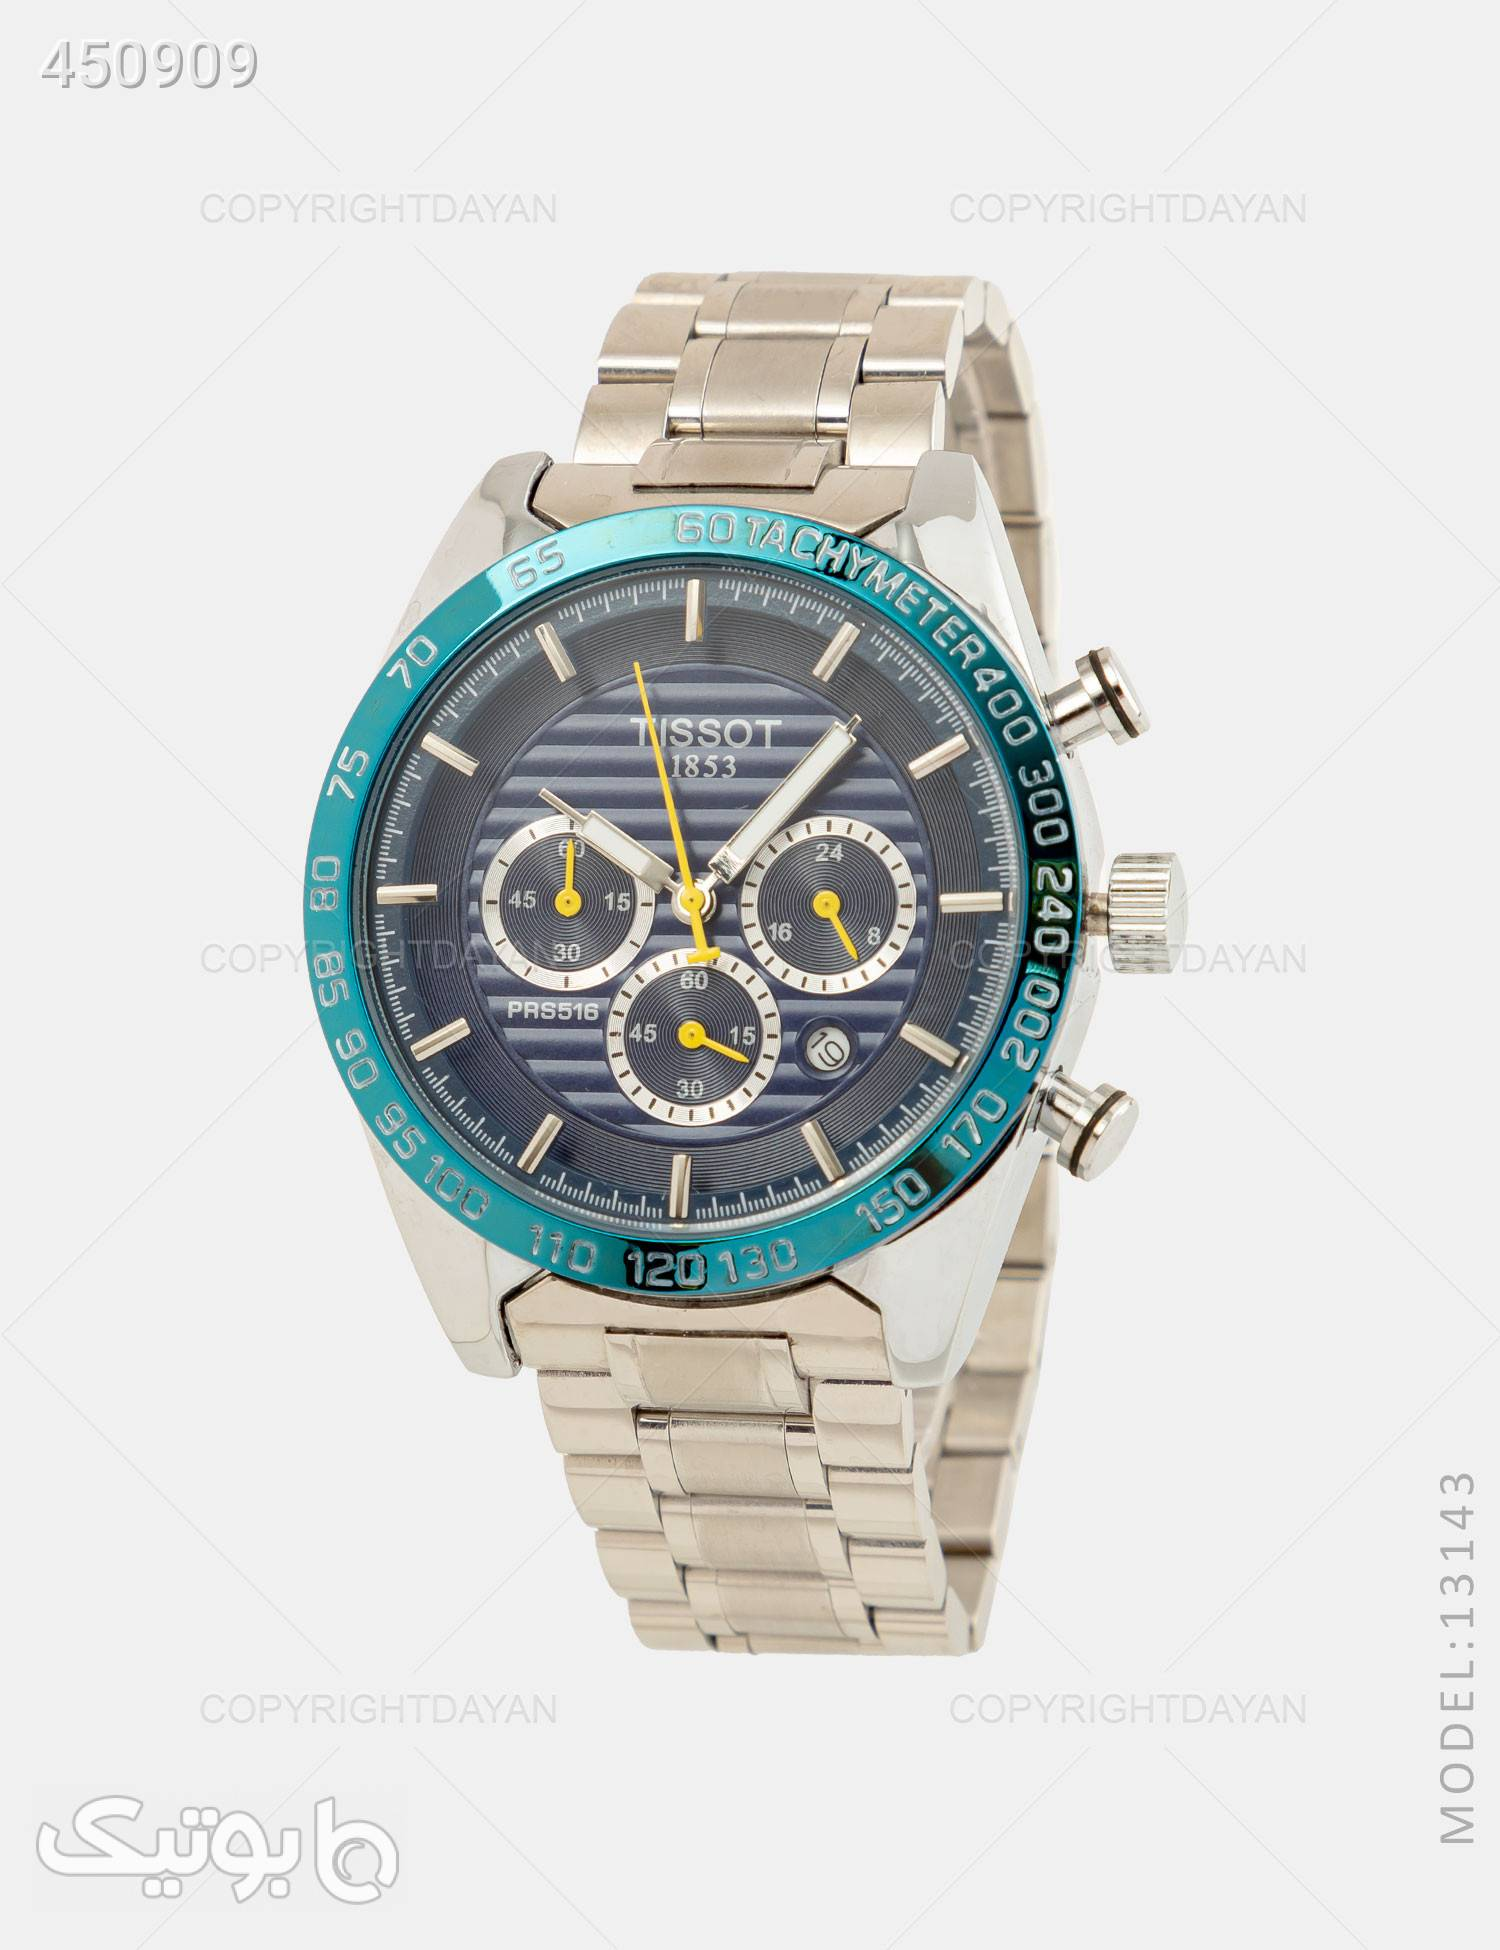 ساعت مچی مردانه Tissot مدل 13143 نقره ای ساعت